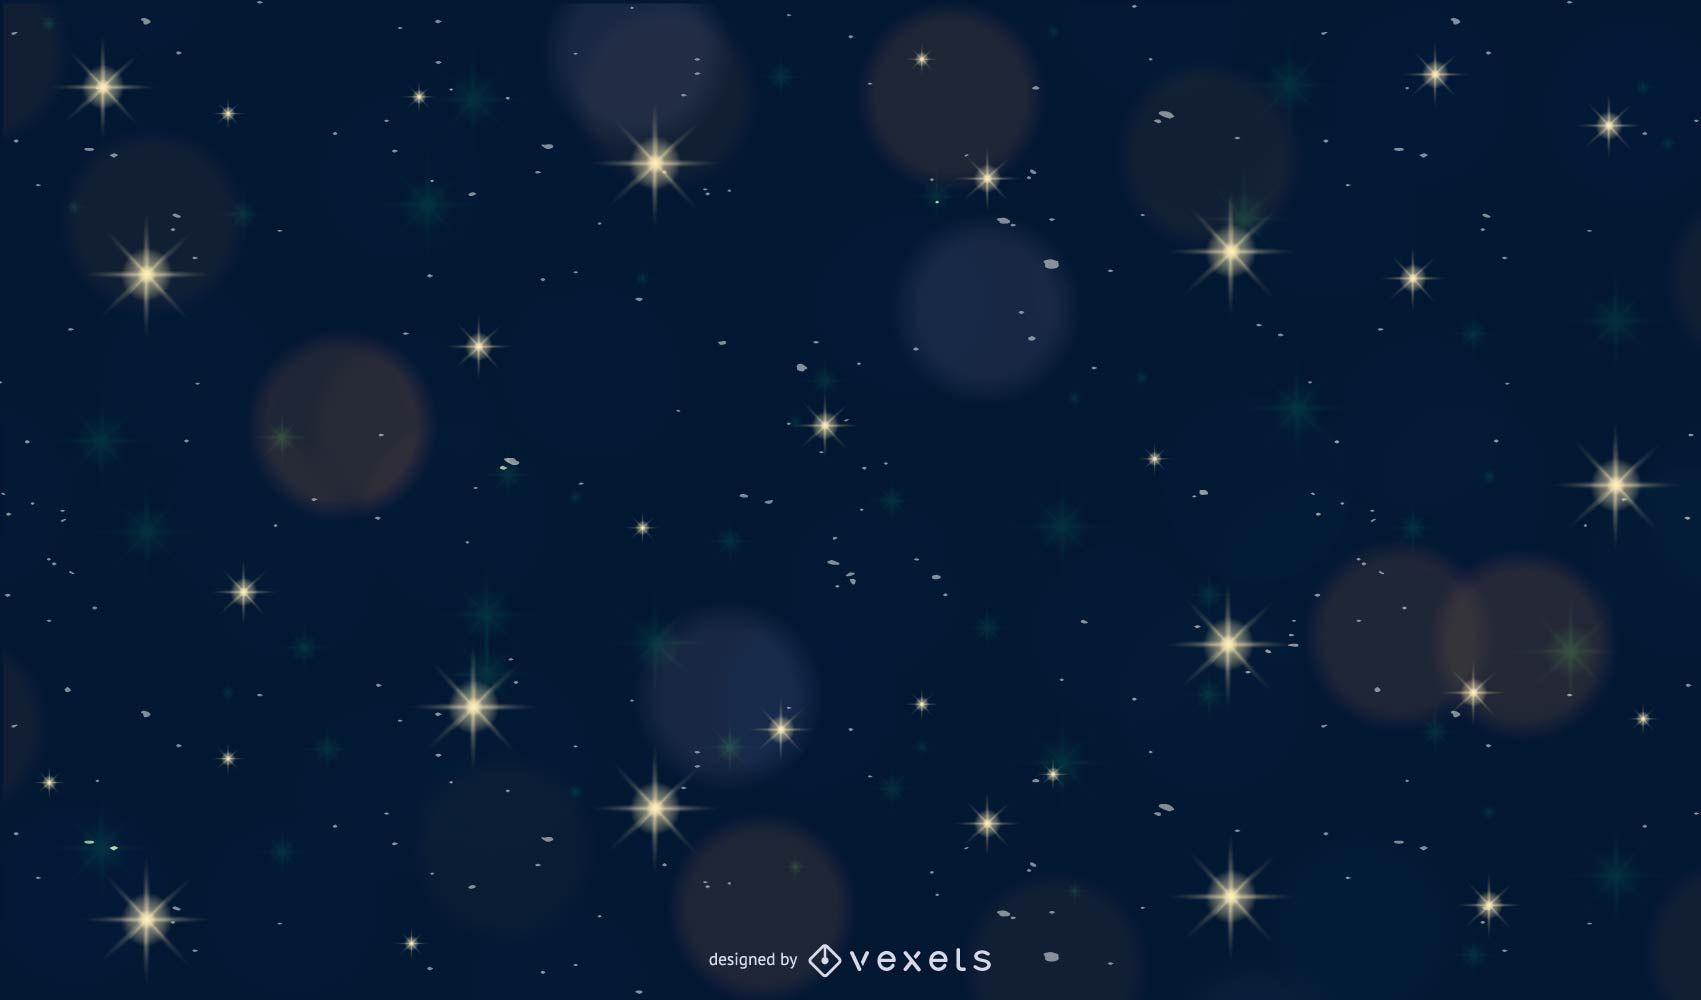 Shiny Bokeh with Starlight Night Background